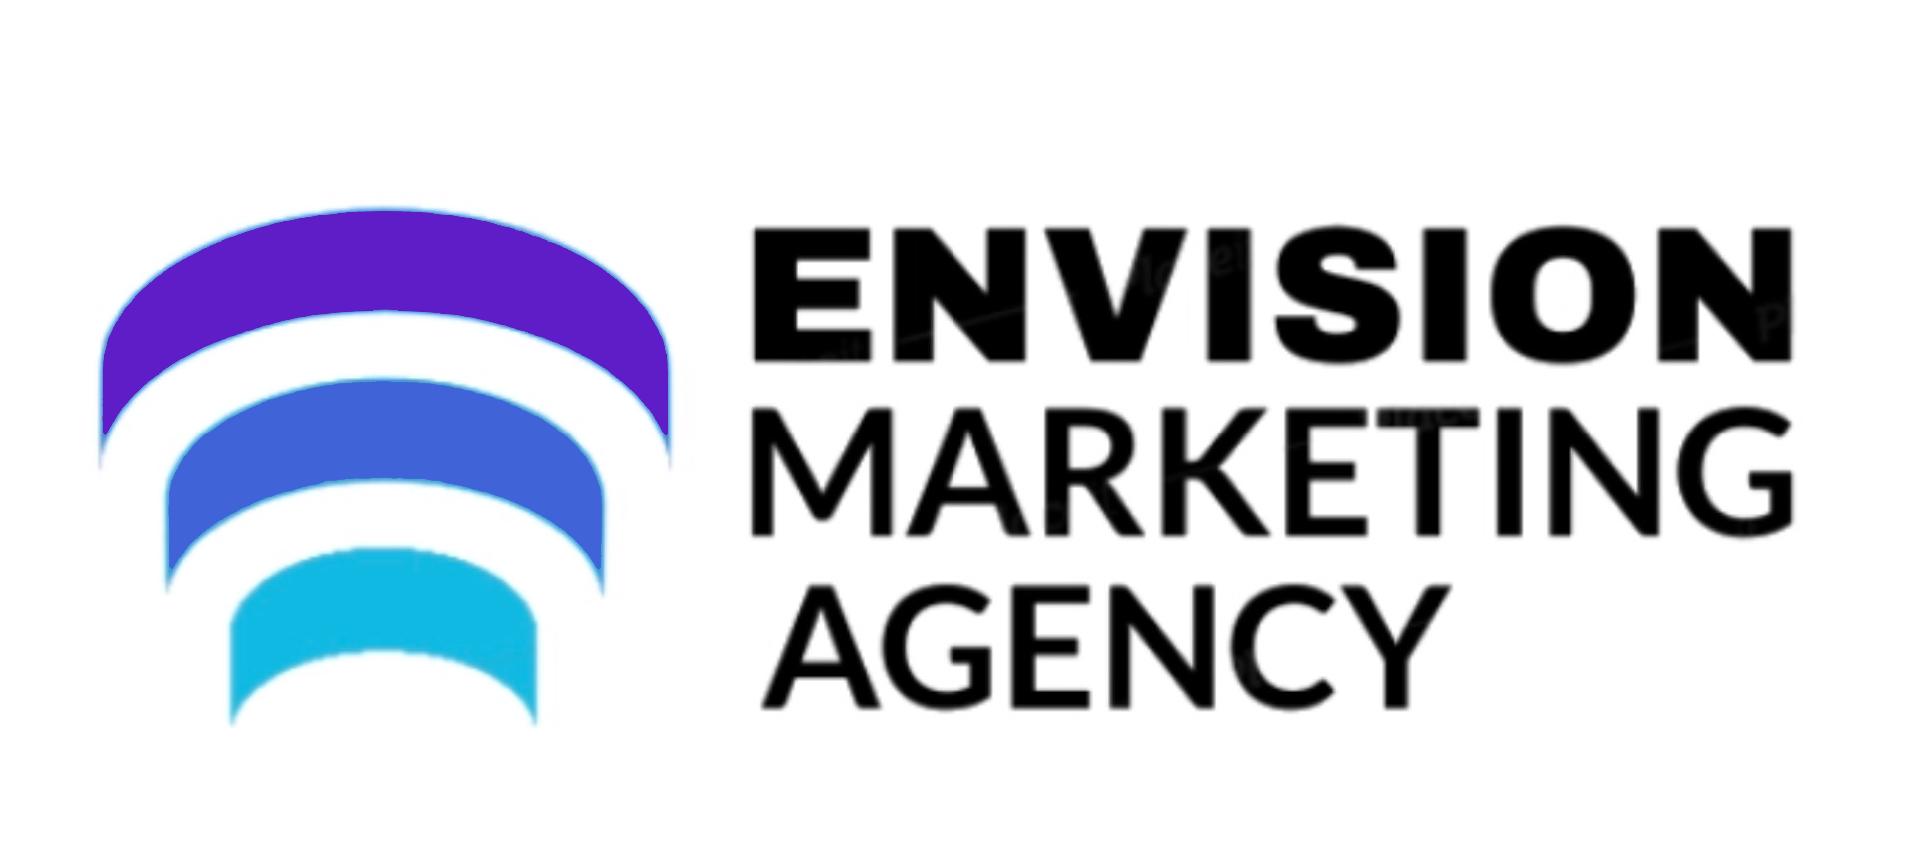 Envision Marketing Agency Logo